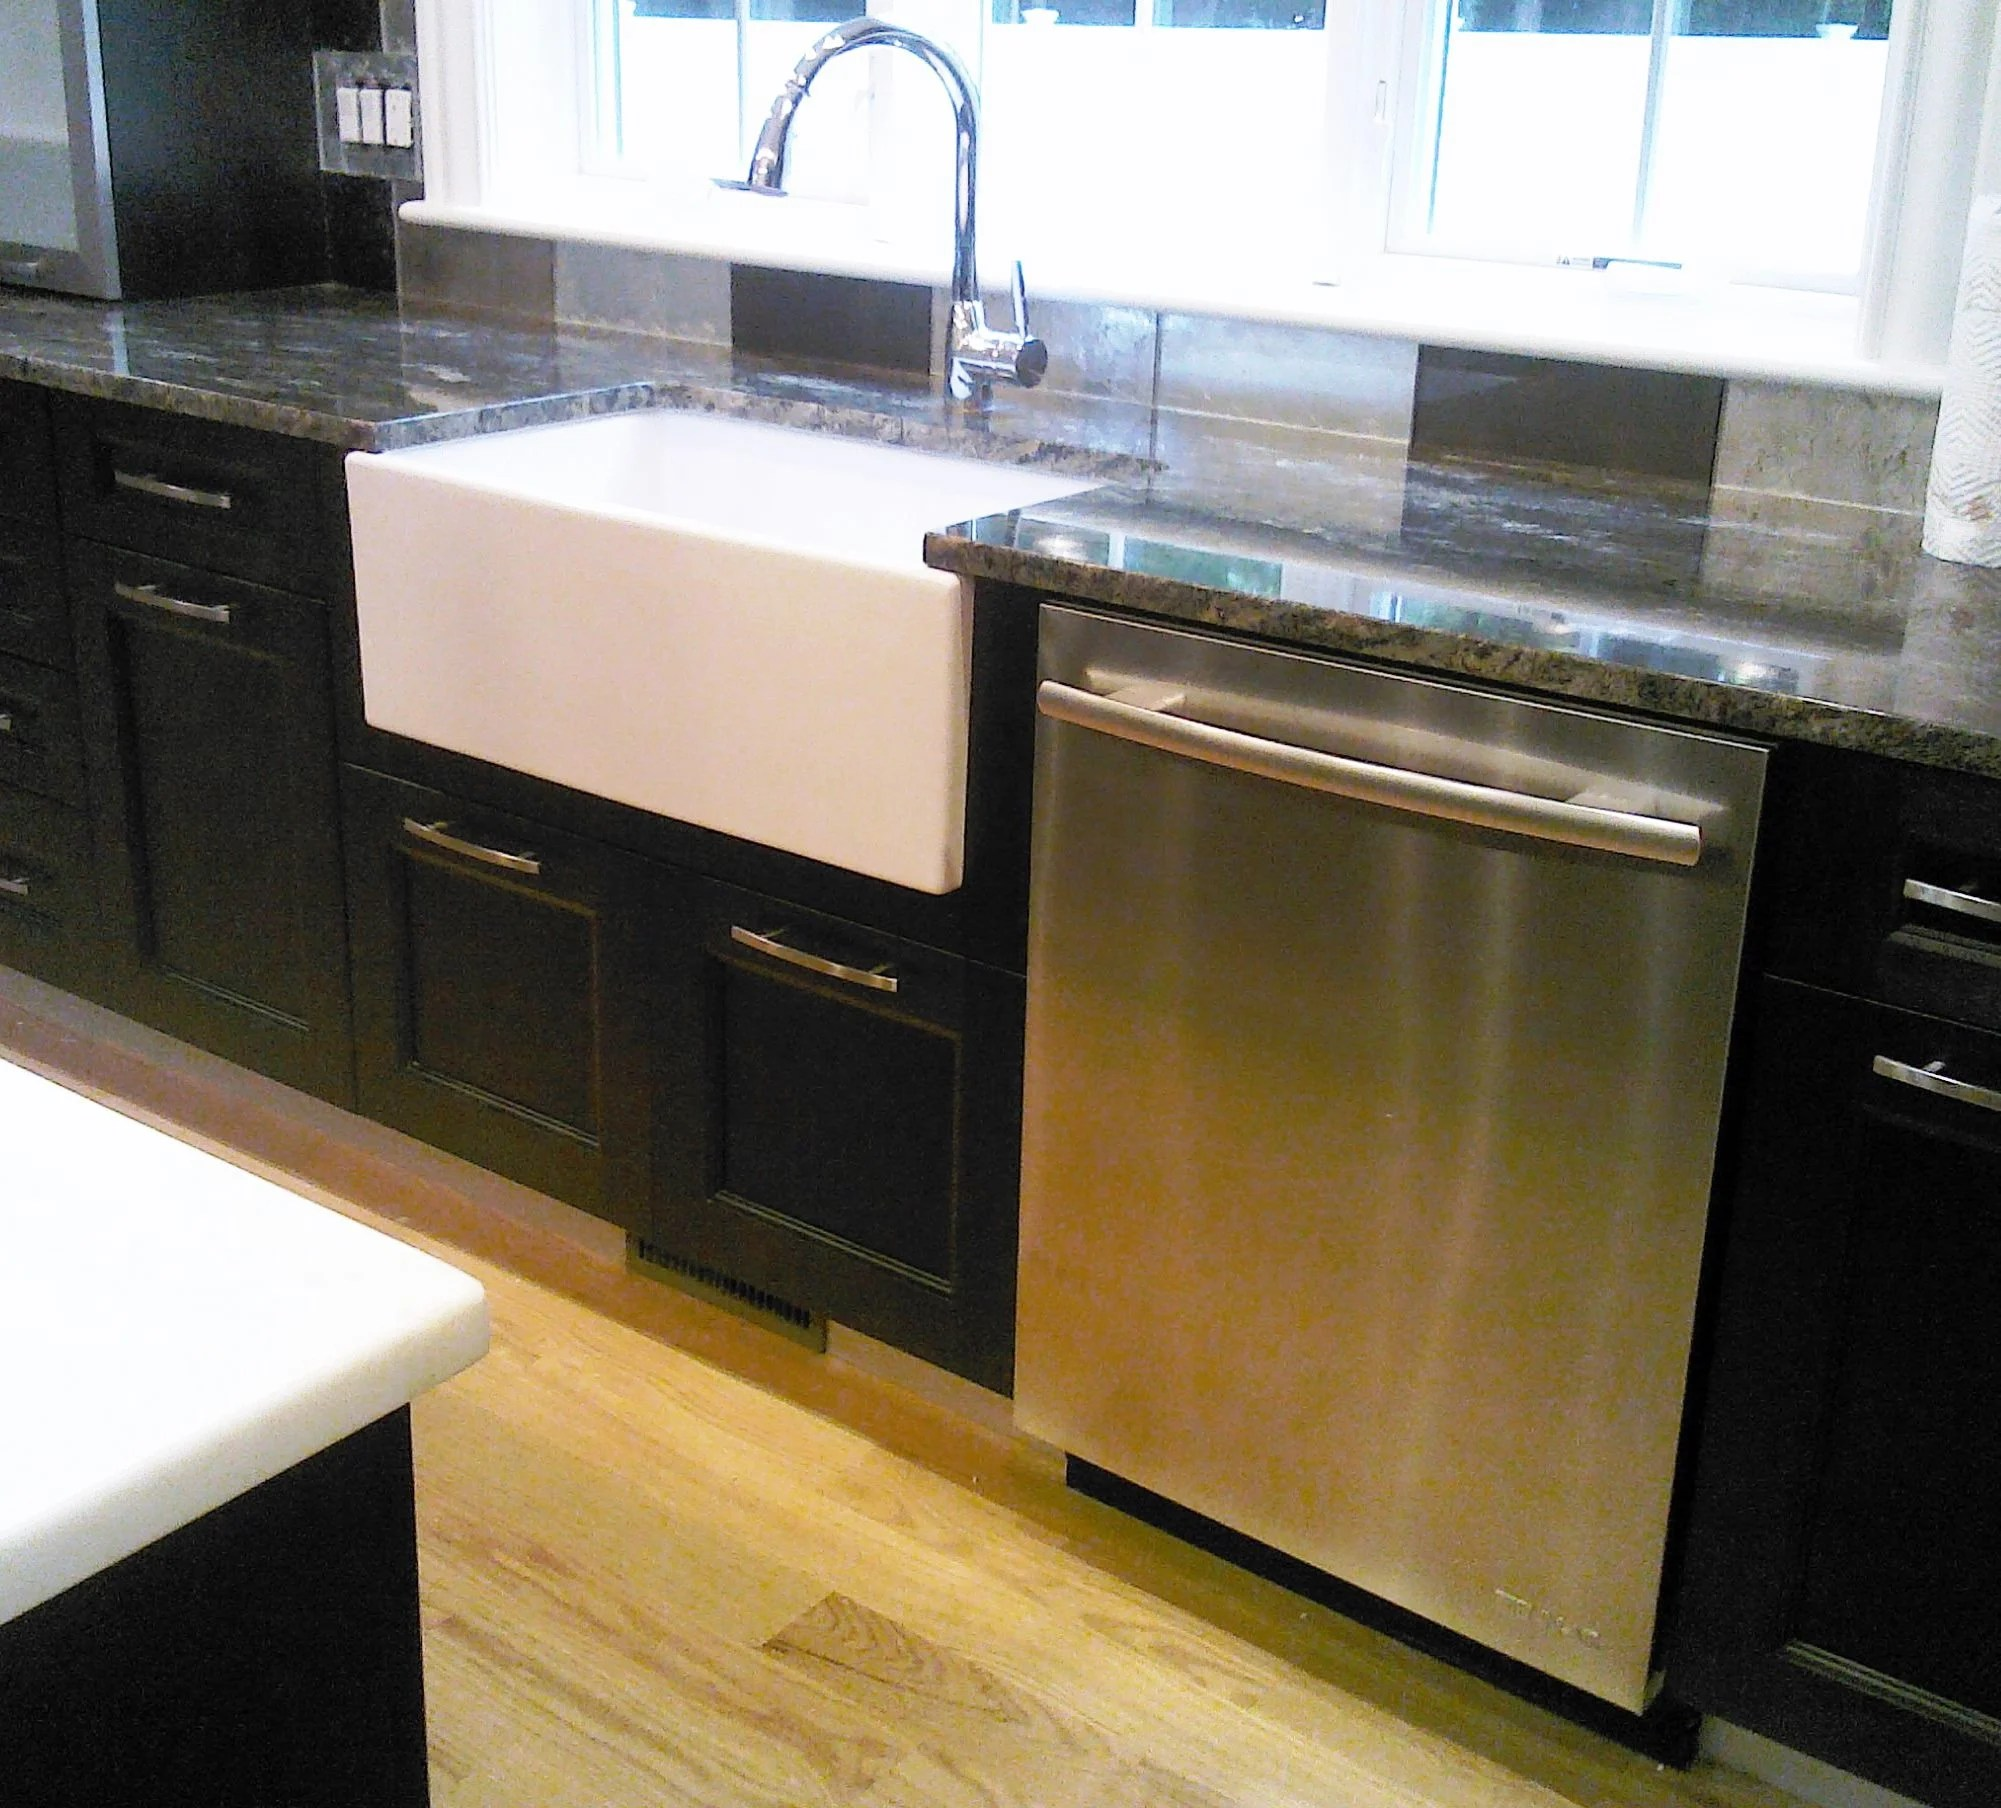 YXByb farm kitchen sink Apron front kitchen sink cast iron Black Granite Farmhouse Kitchen Sink U Quicua